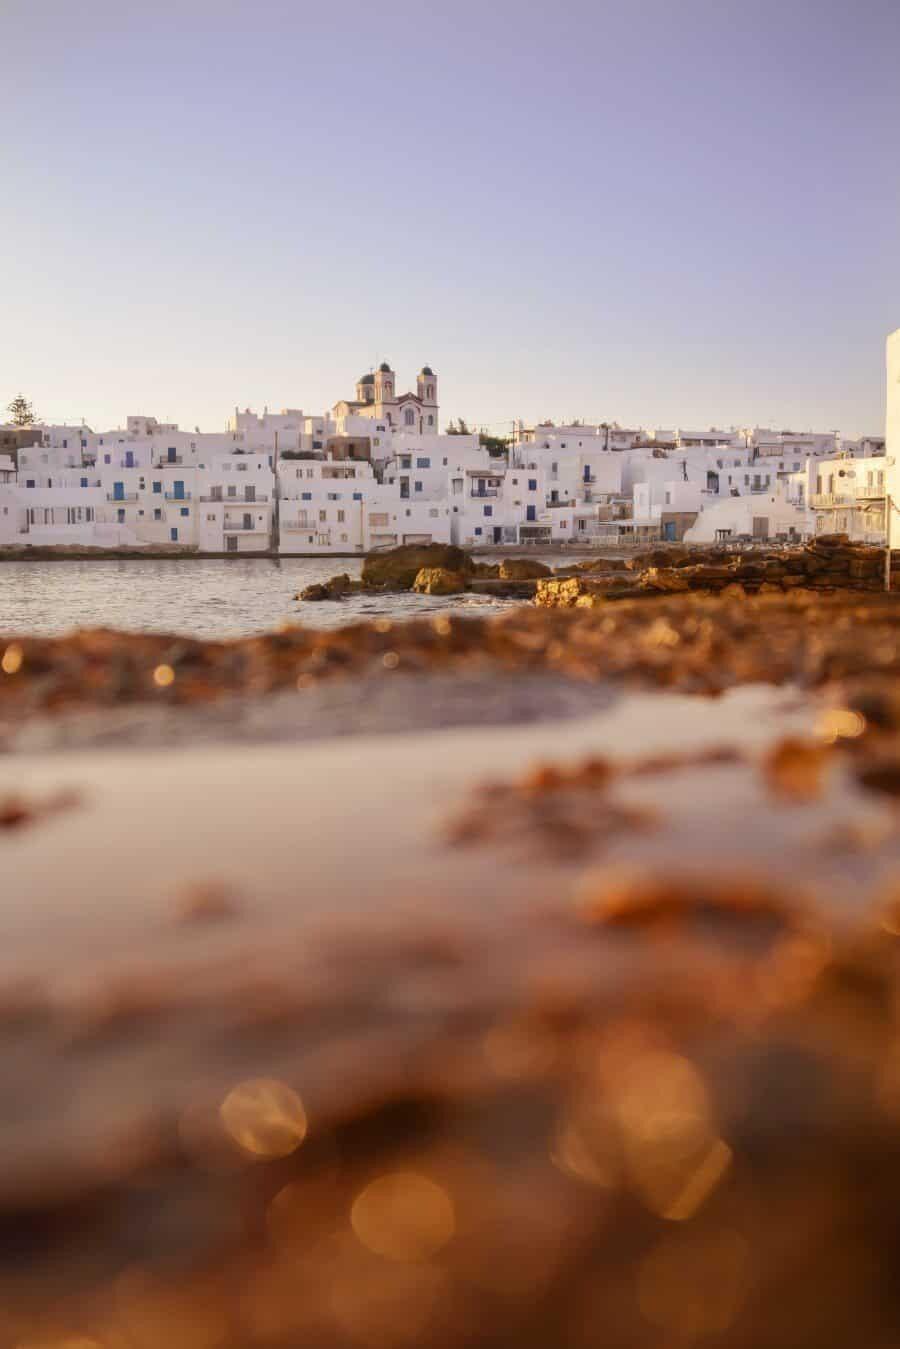 paros-island-greek-islands-by-the-wandering-lens-30